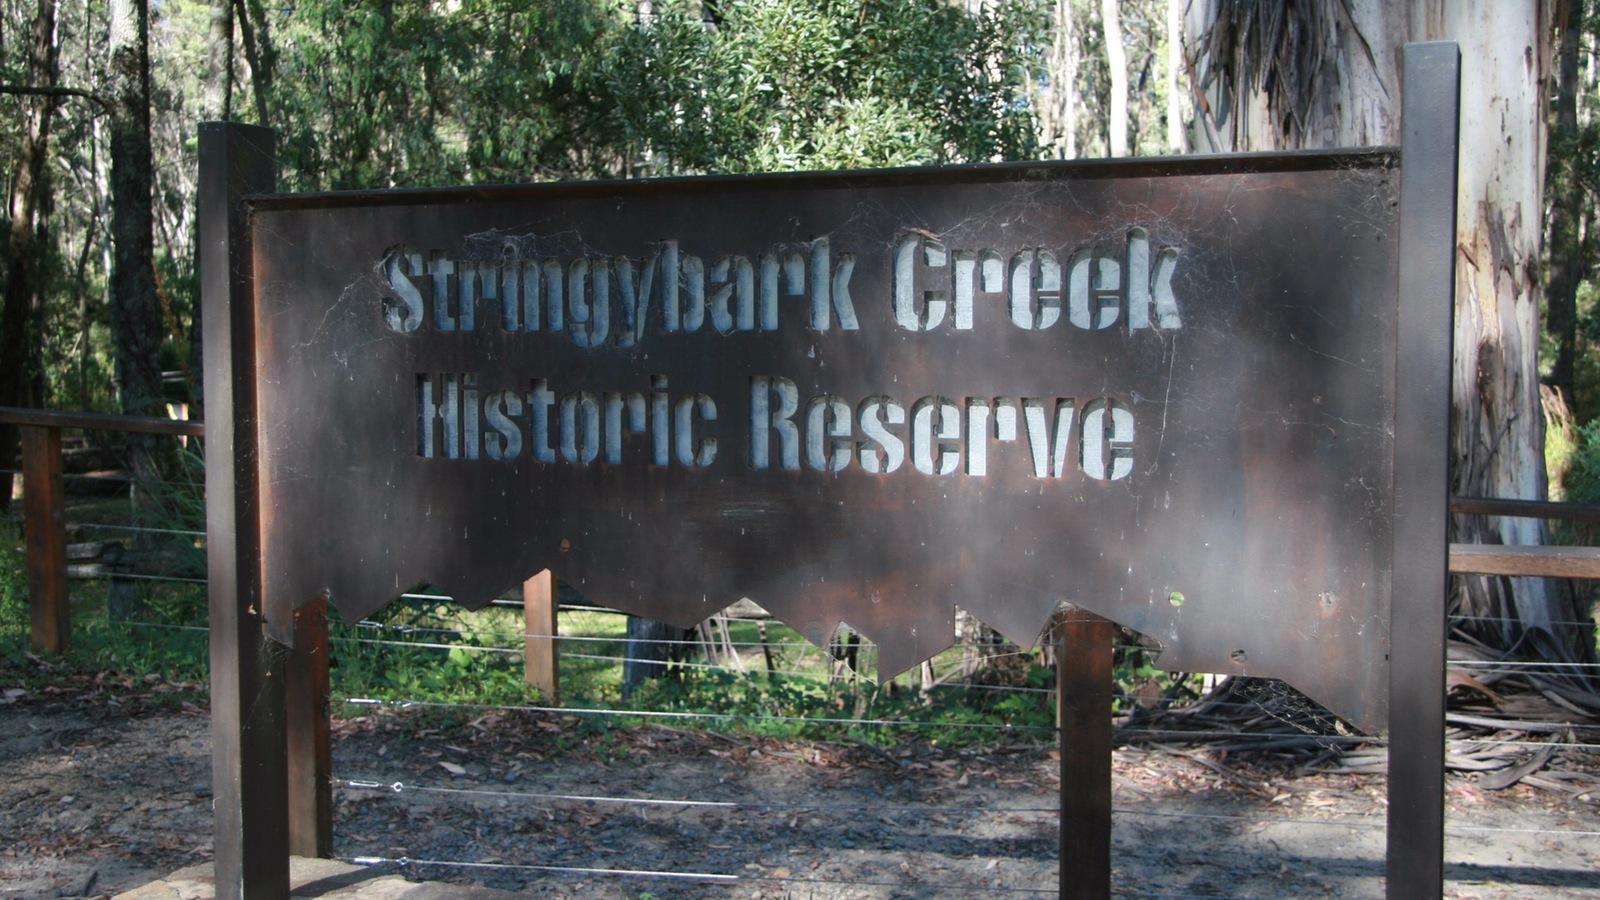 Stringybark Creek sign